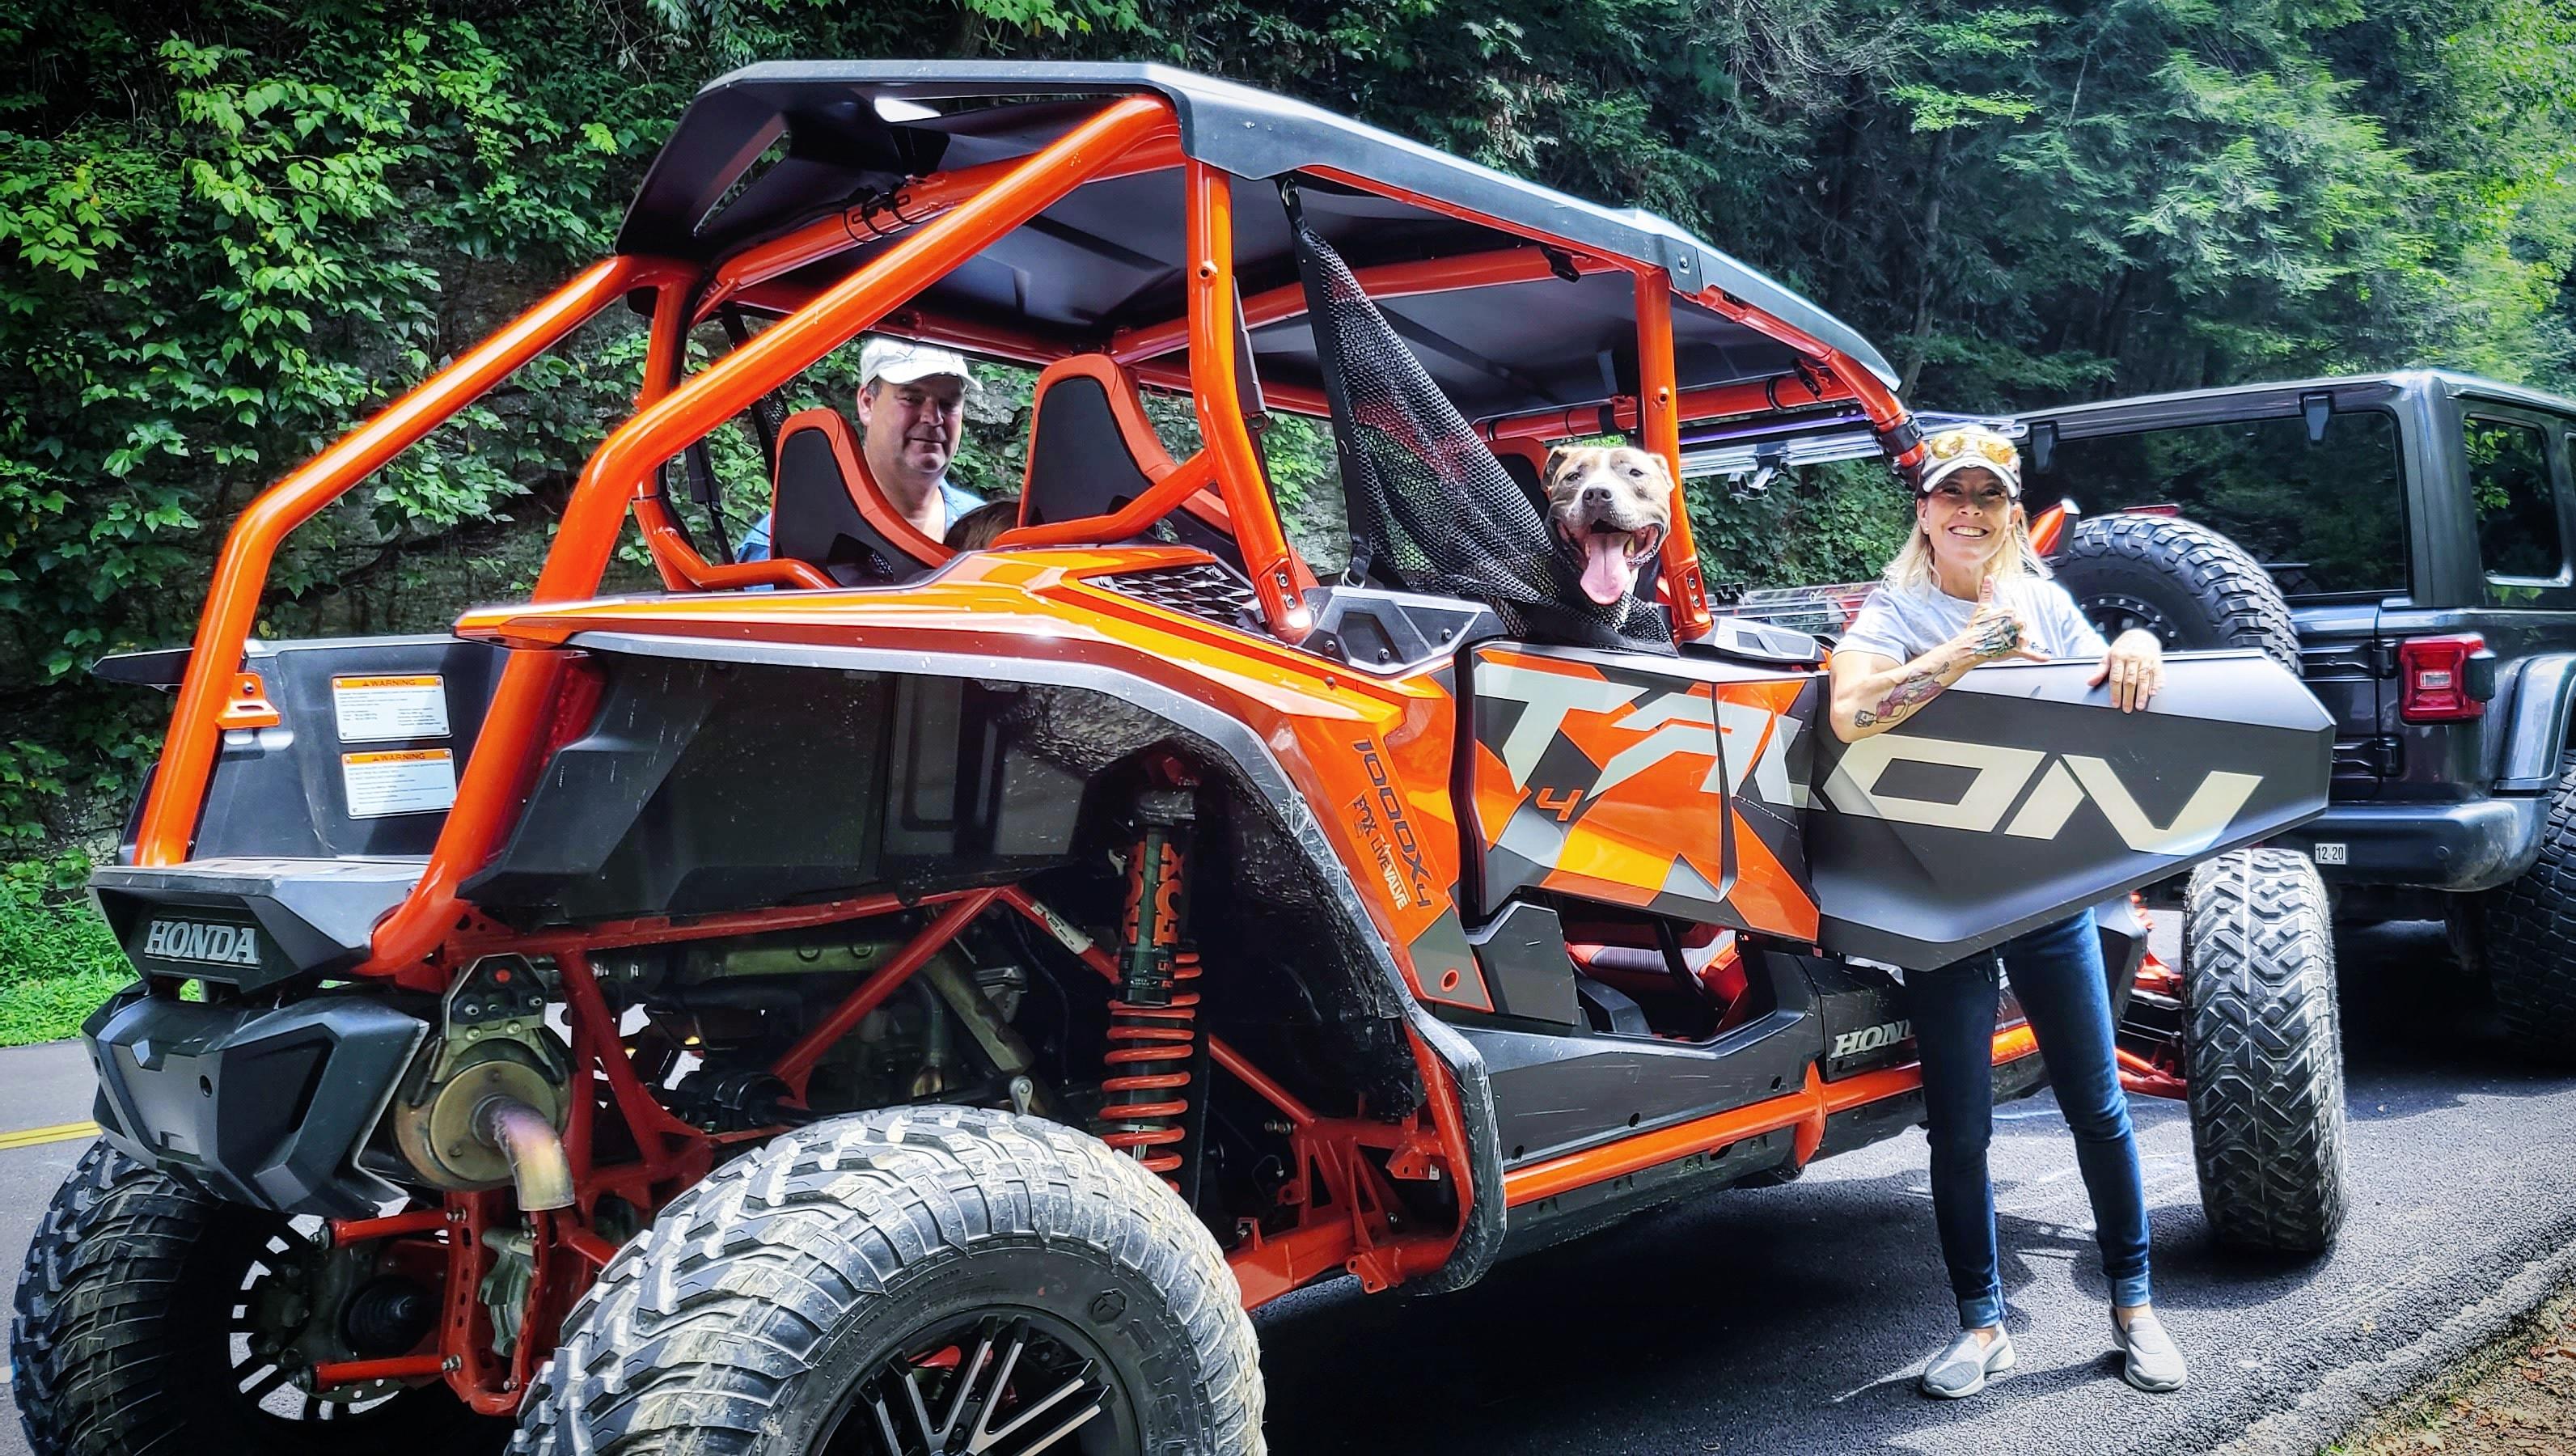 Smoky Mountain Adventure Rentals 15